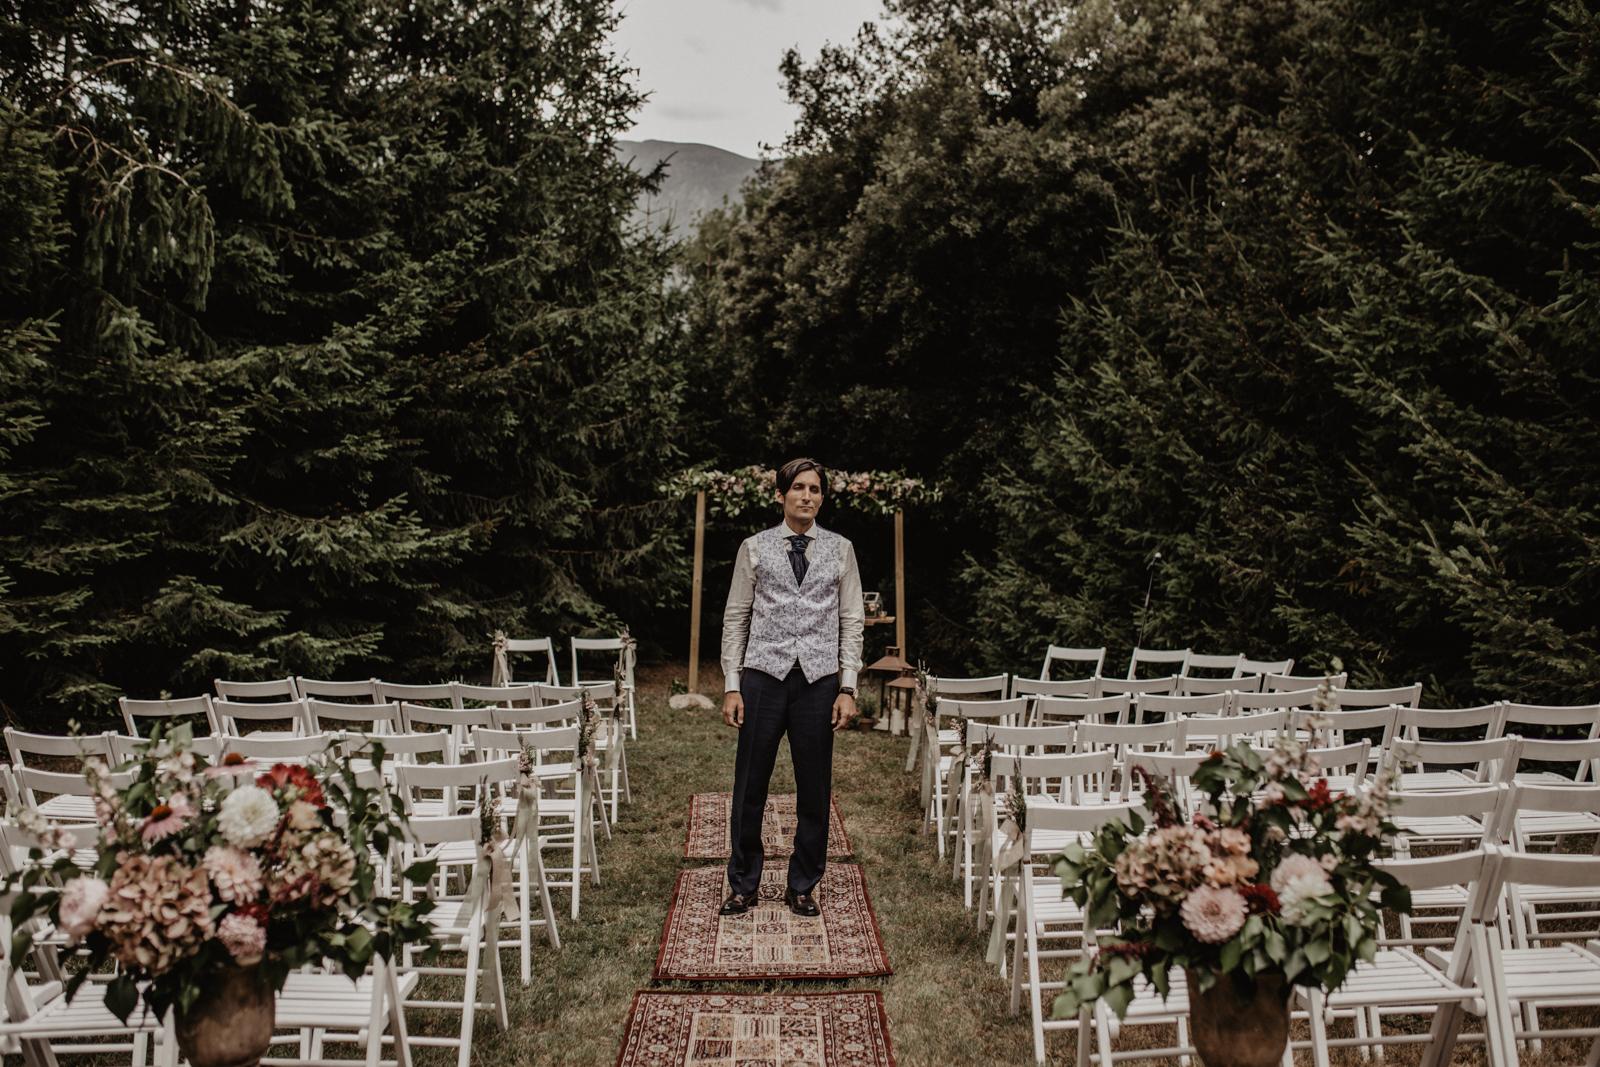 thenortherngirlphotography_photography_thenortherngirl_rebeccascabros_wedding_weddingphotography_weddingphotographer_barcelona_bodaenbarcelona_bodaenmaselmarti_bodarogeryvane-248.jpg